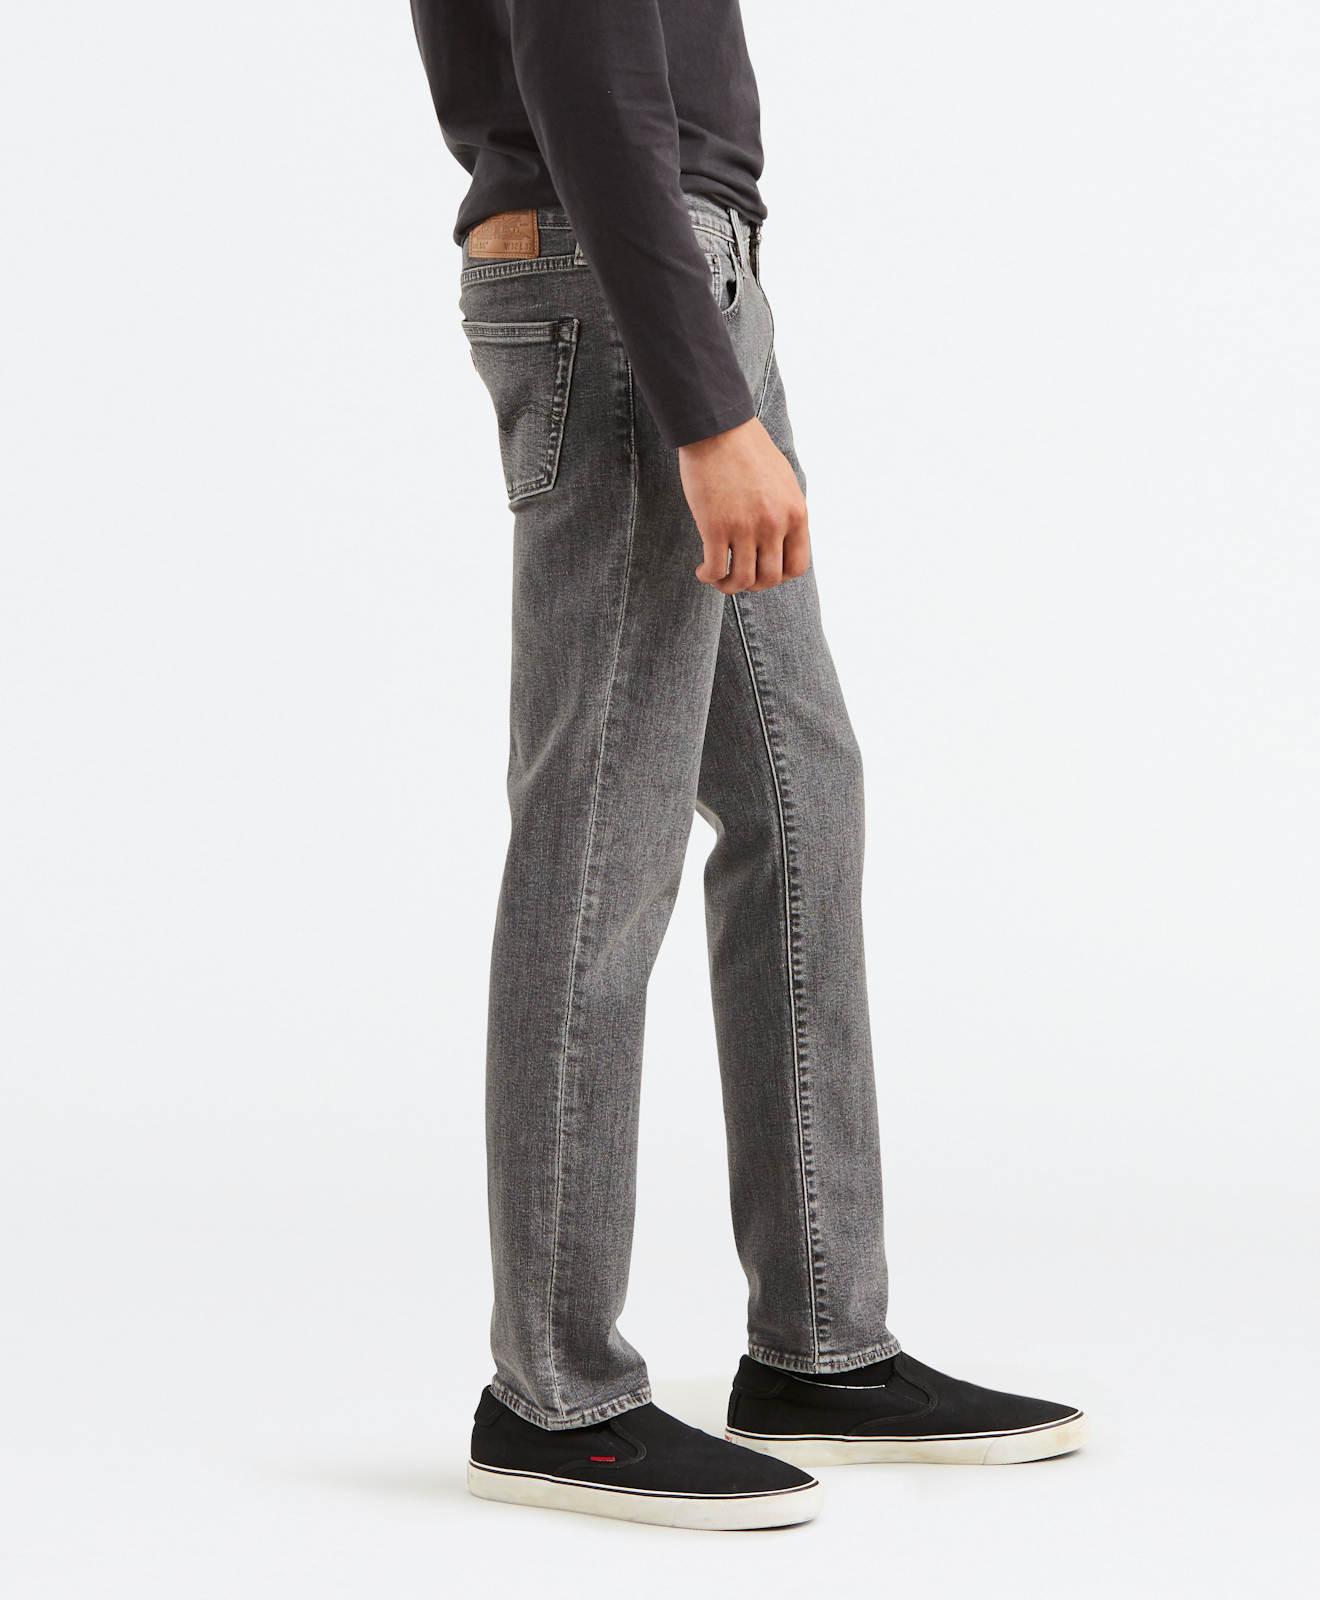 Hose ® Levis Herren Denim Adv Slim Fit 04511 Ufqgn 511 Jeans Albany 2953 nOkX80wP